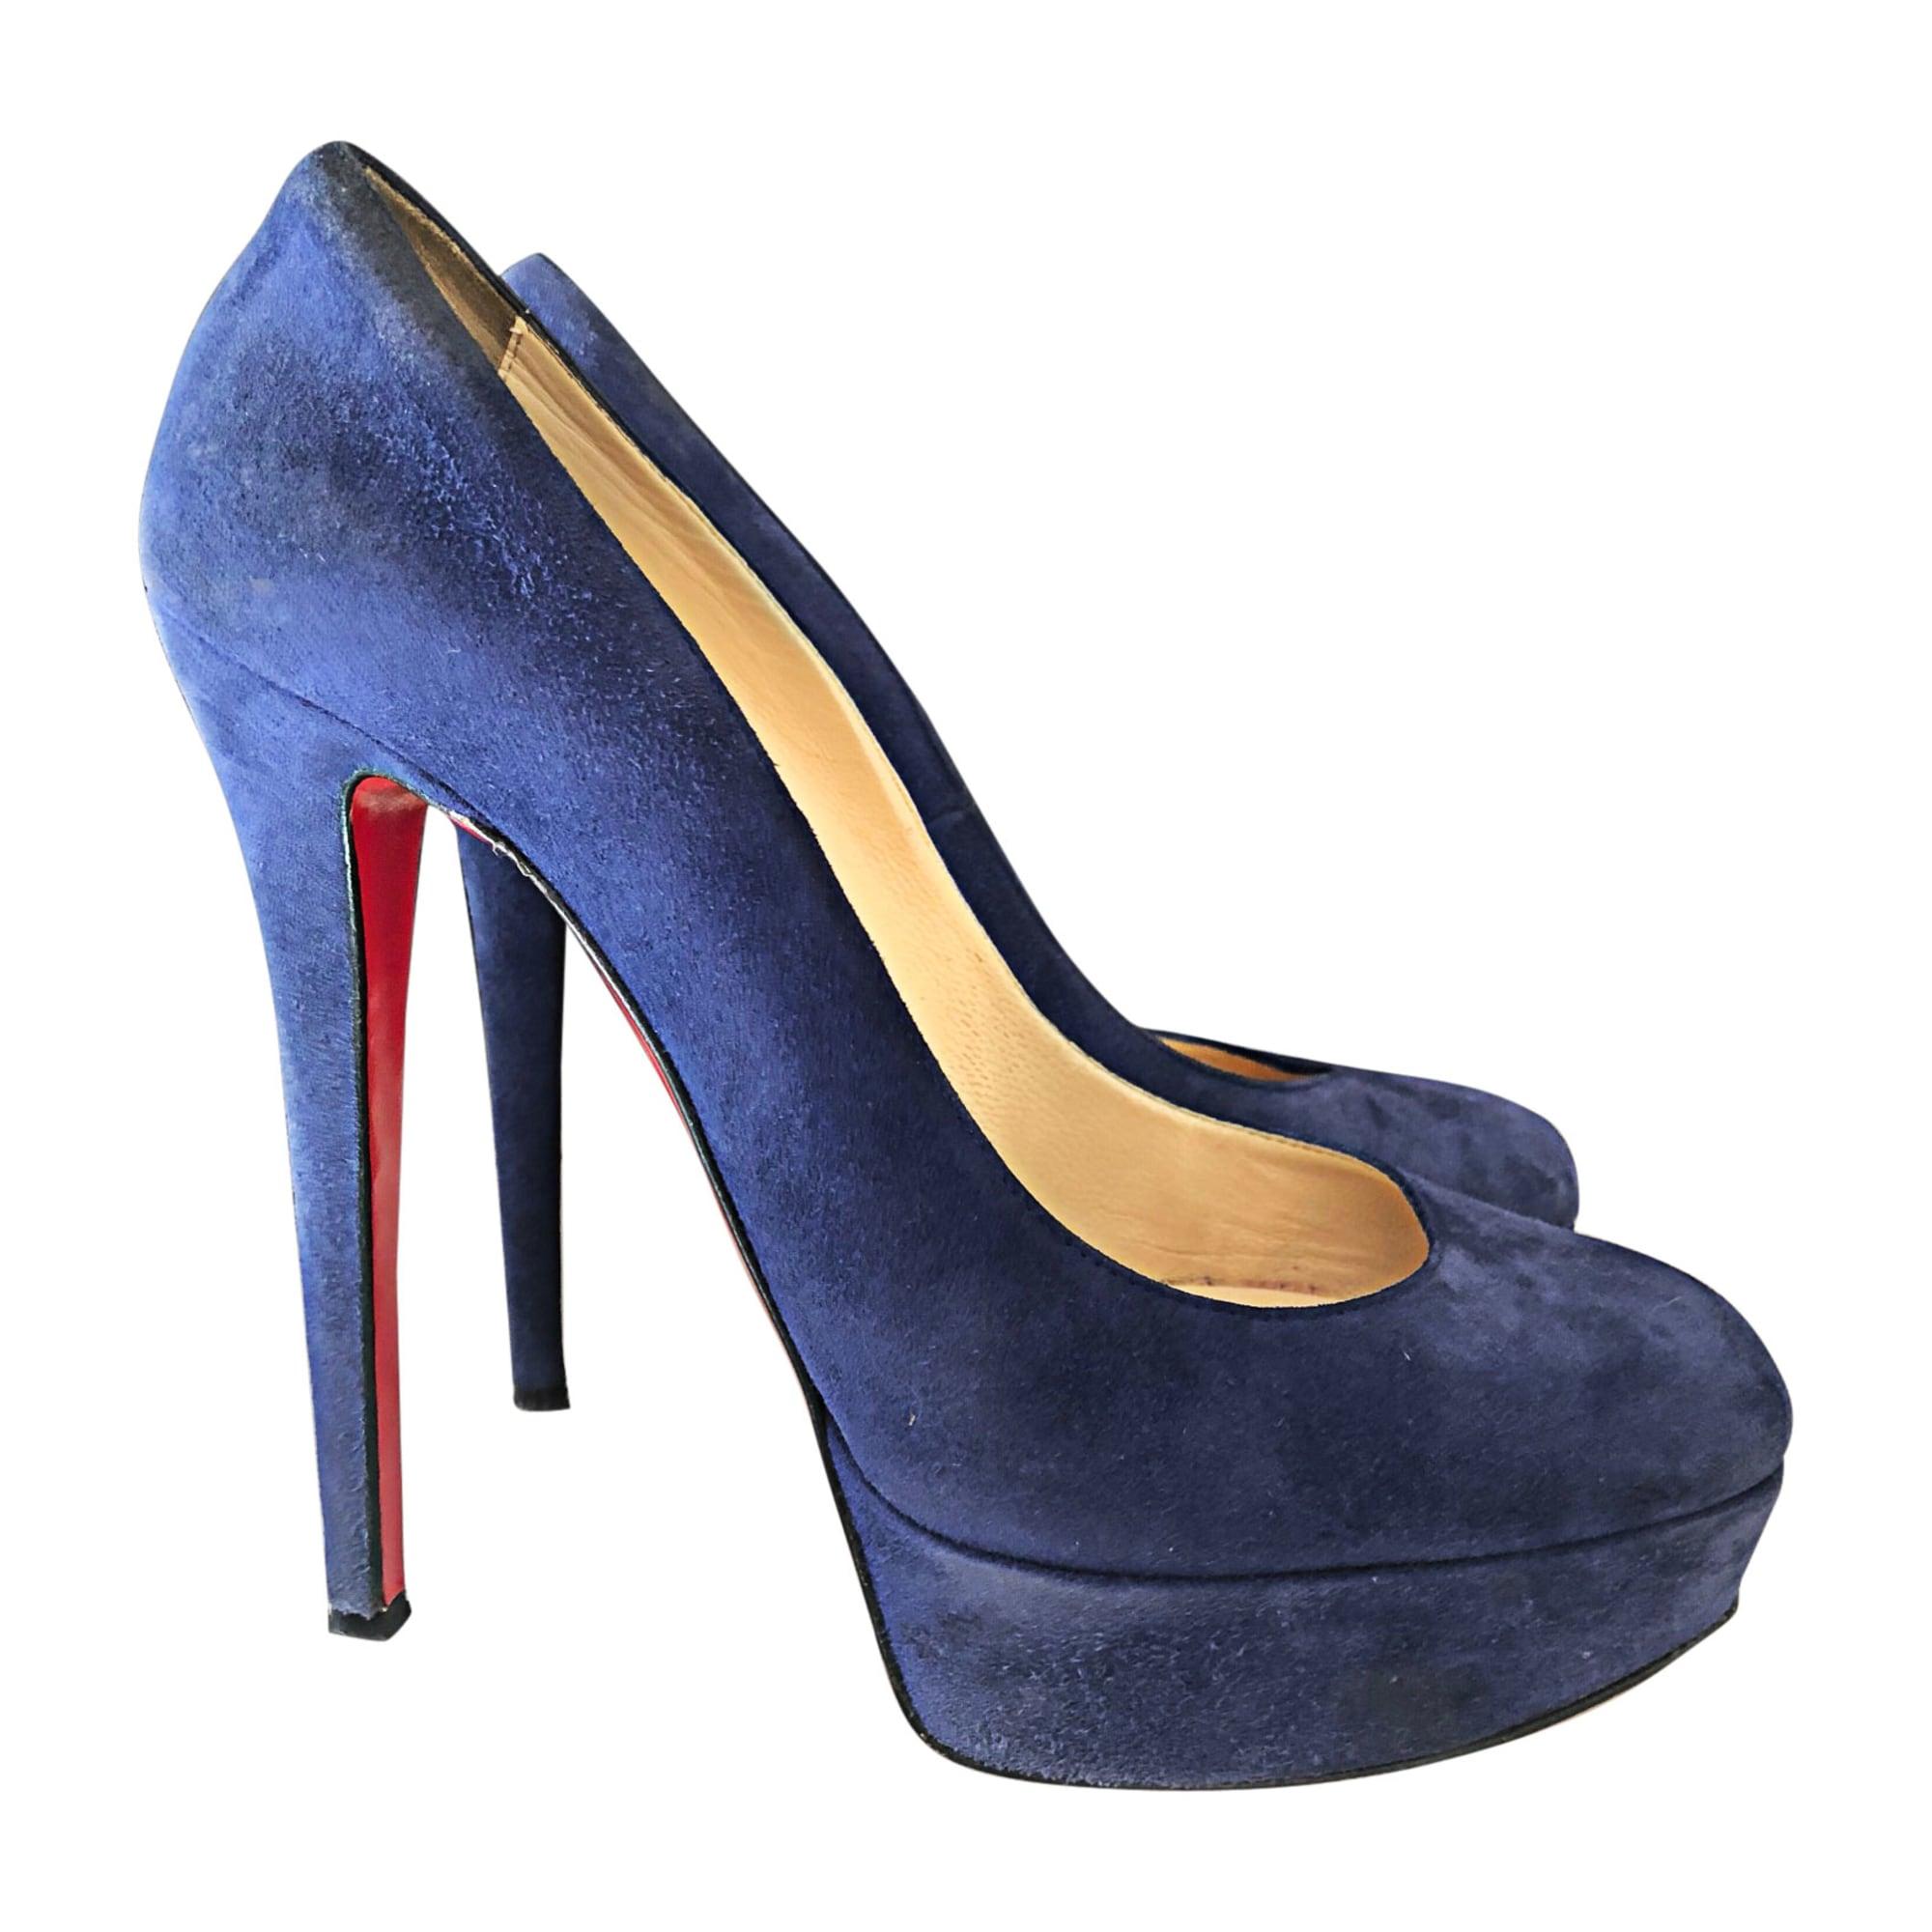 Escarpins compensés CHRISTIAN LOUBOUTIN Bleu, bleu marine, bleu turquoise